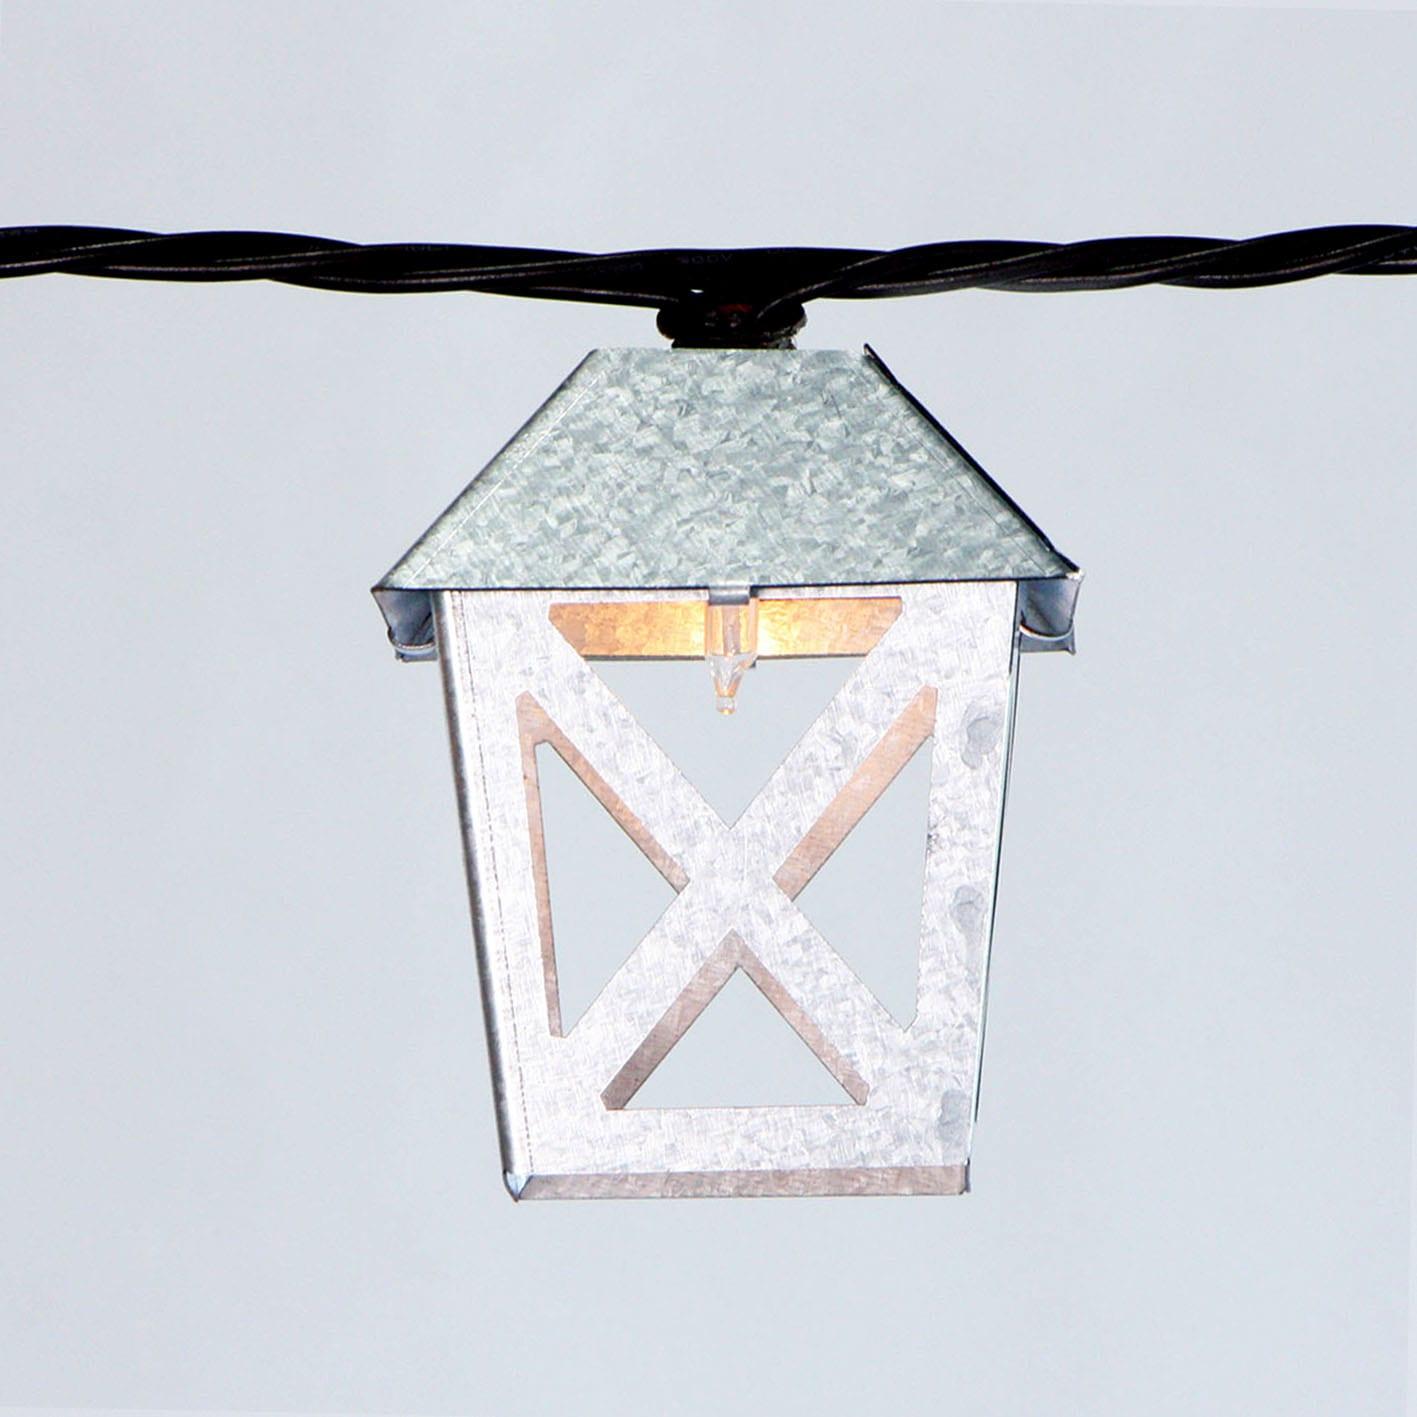 Galvanized Roll Micro Mini Led String Lights - Metal Covers  MYHH01365 – Zhongxin